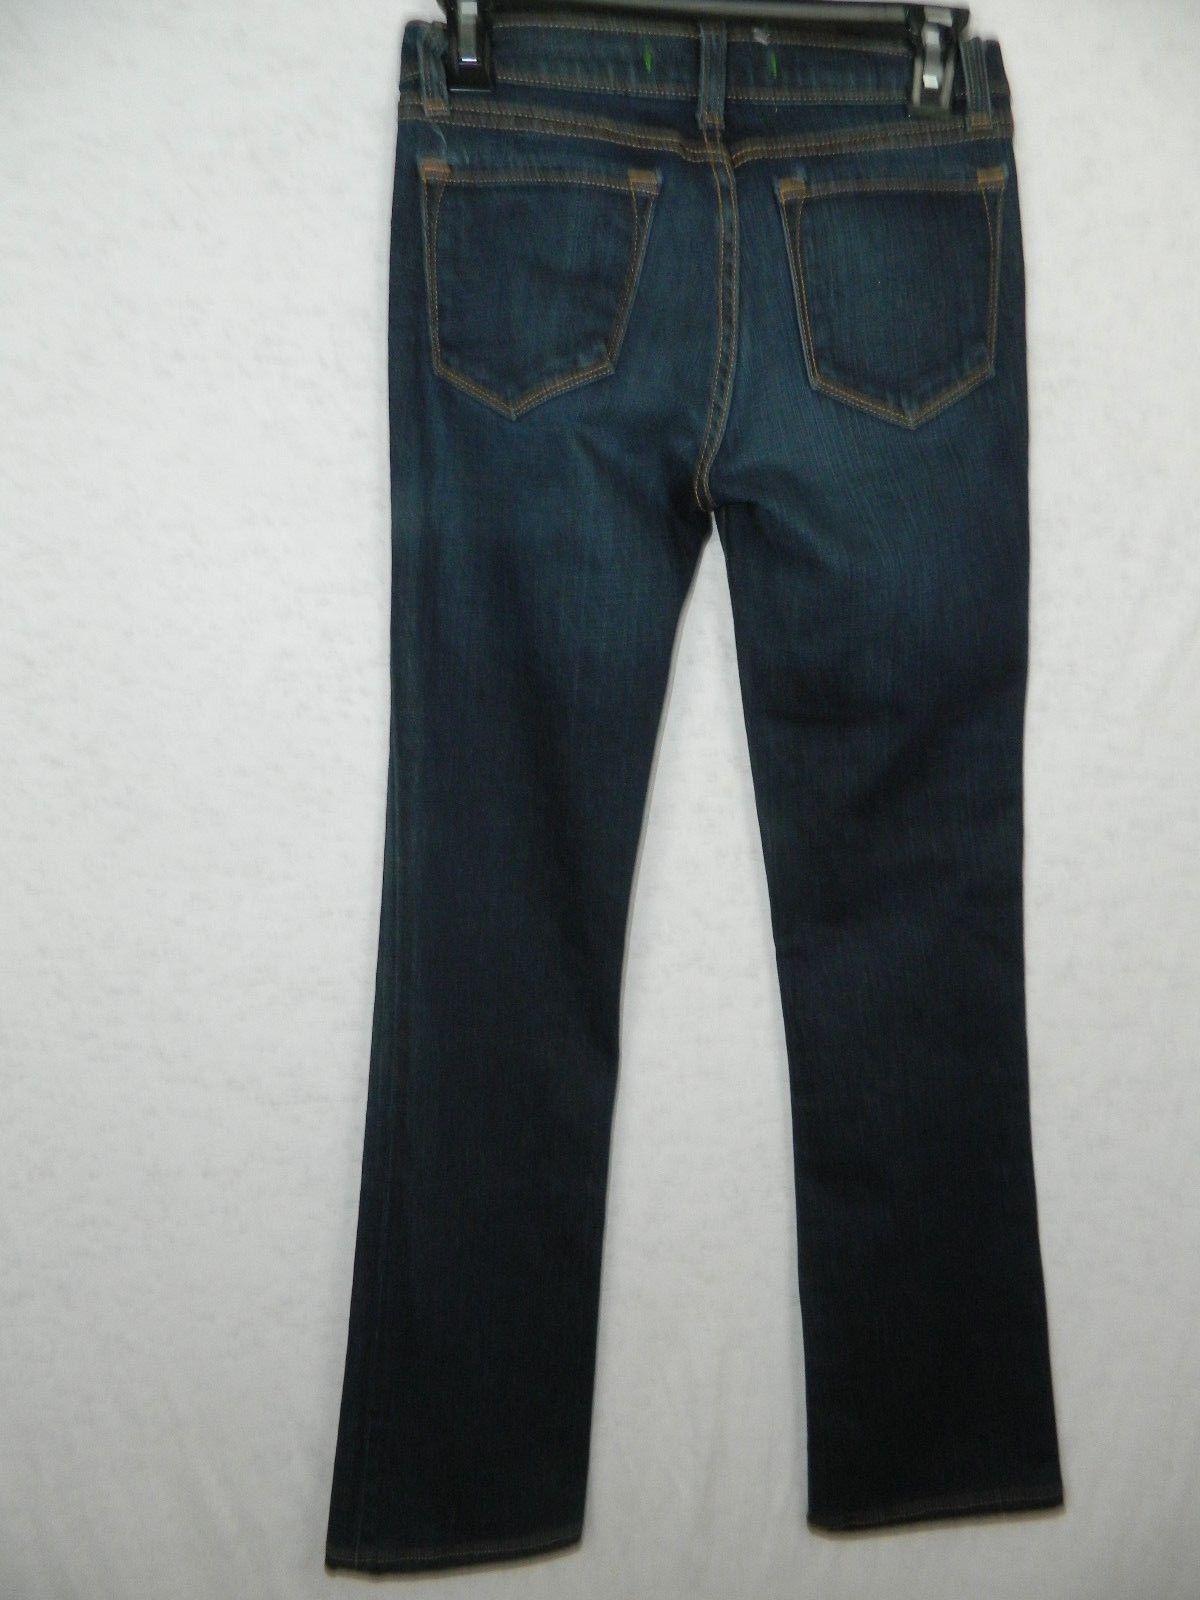 J Brand Jeans Straight Leg Jeans  Dark Wash Style #805 Size 25 image 4